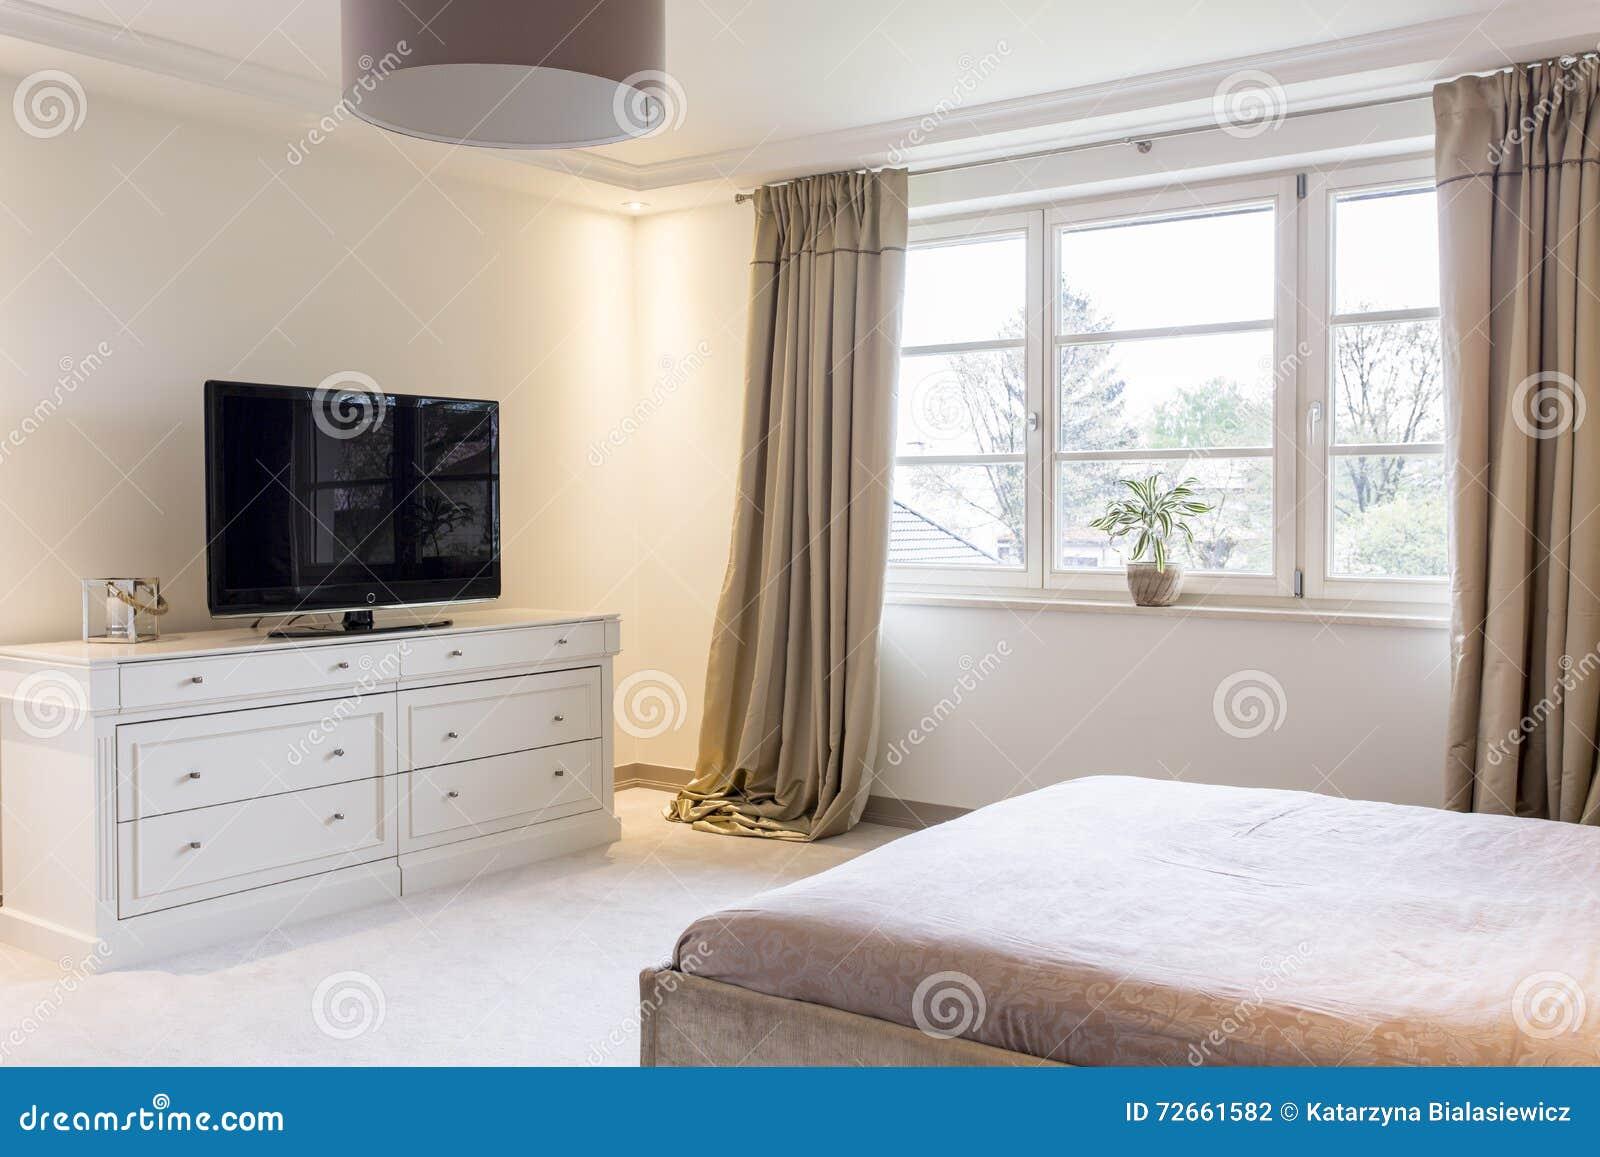 Ontspan In Mooie Slaapkamer Met TV Stock Foto - Afbeelding bestaande ...